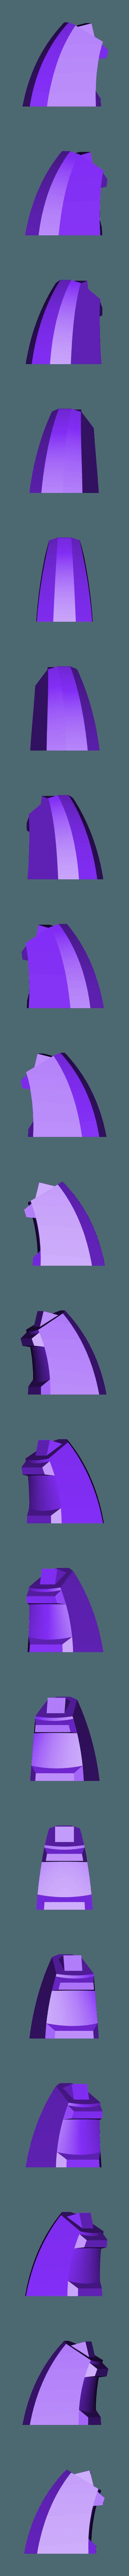 Tail-Upper.STL Download STL file Grimlock • Model to 3D print, biglildesign